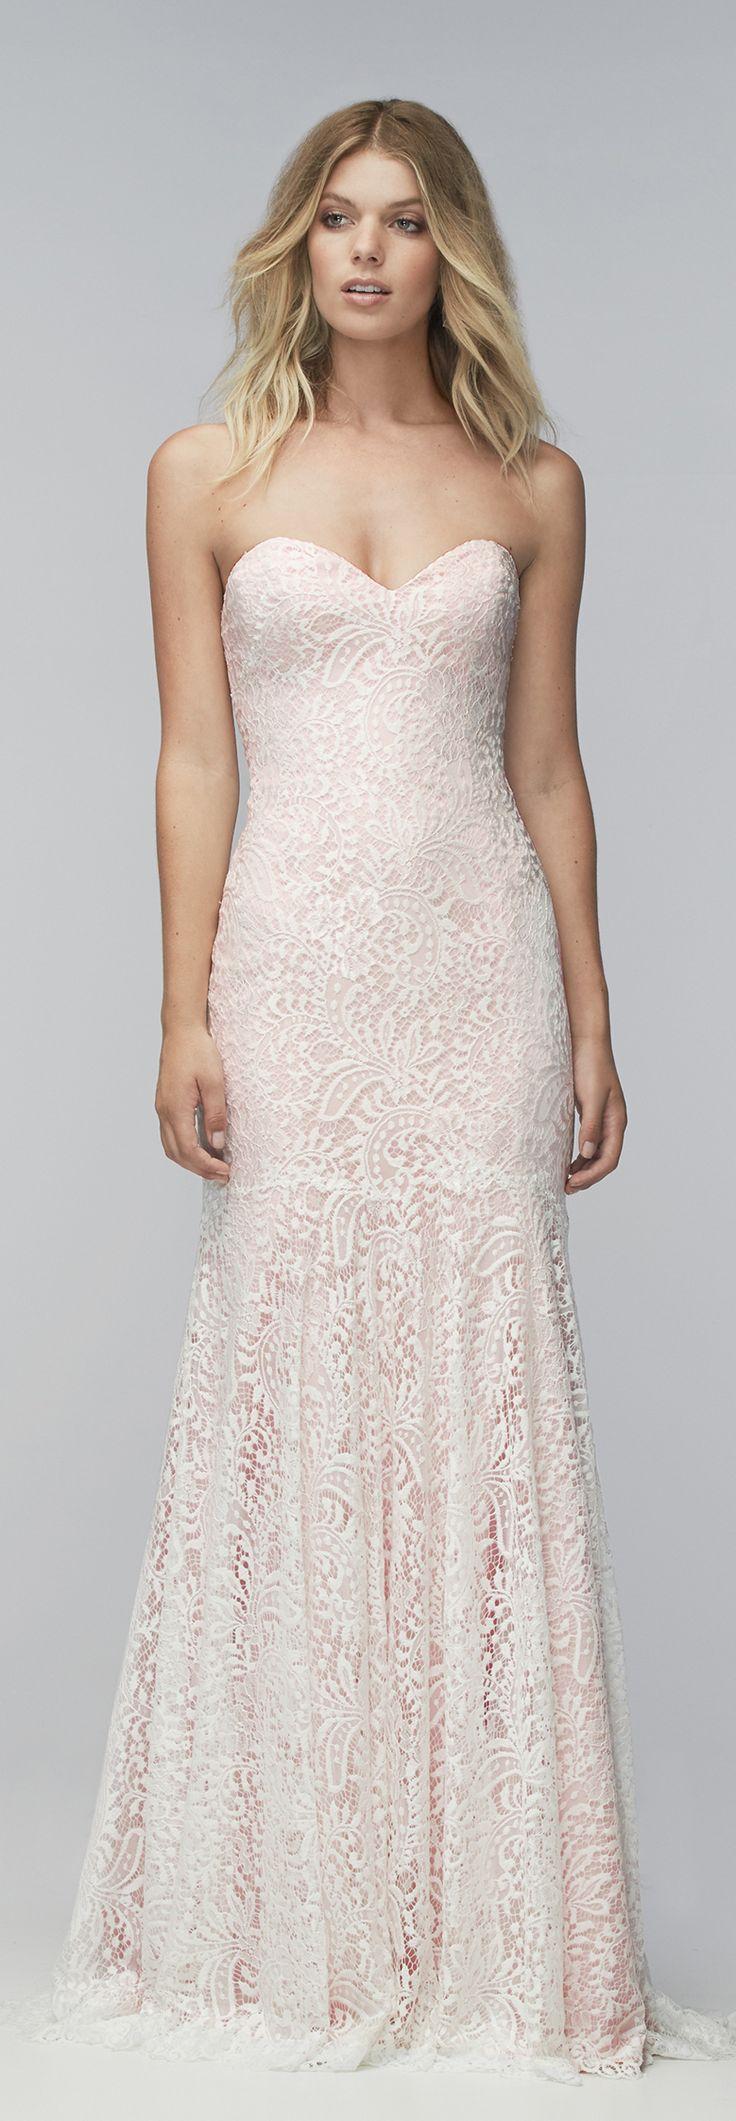 Свадьба - Dress Gallery - Belle The Magazine